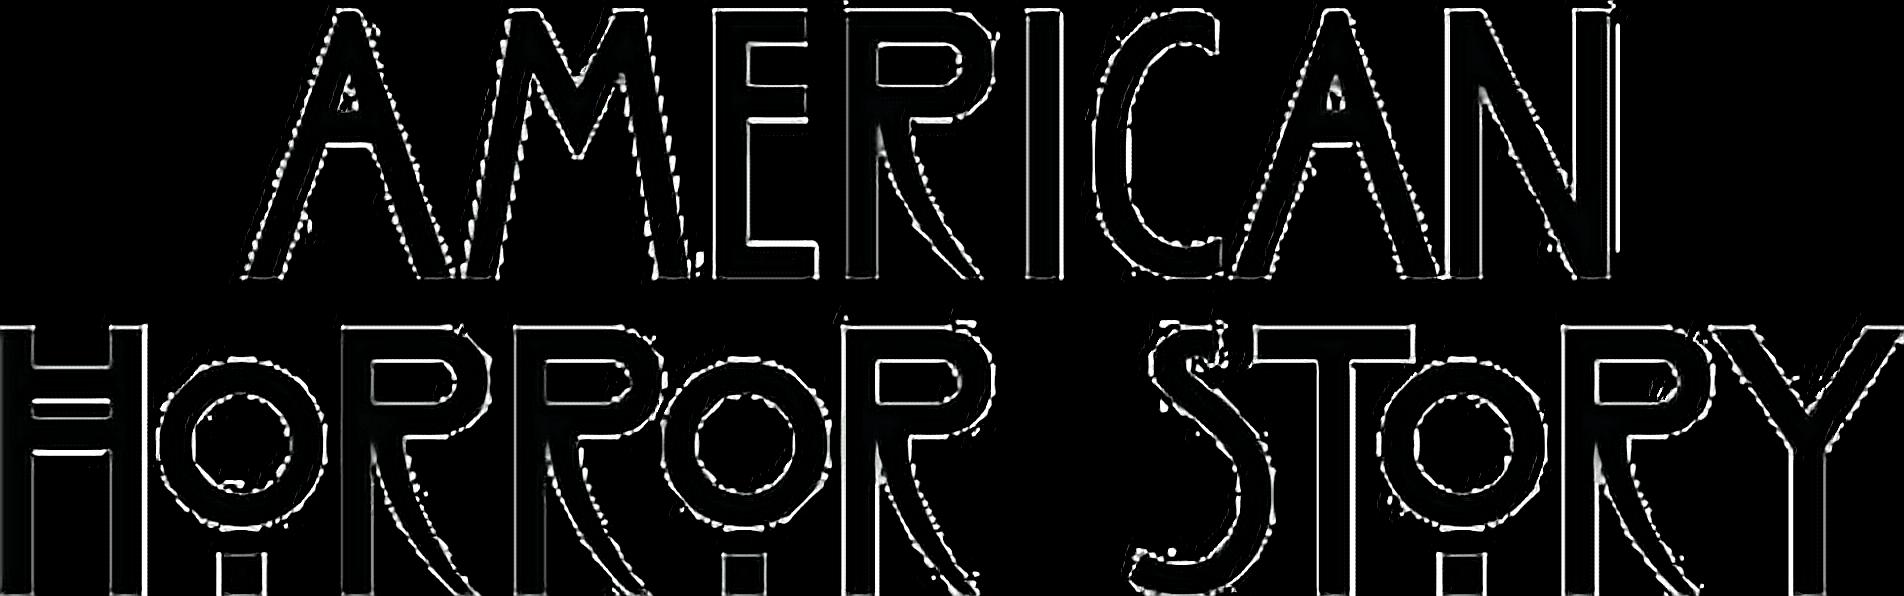 #americanhorrorstory #tumblr #stickers